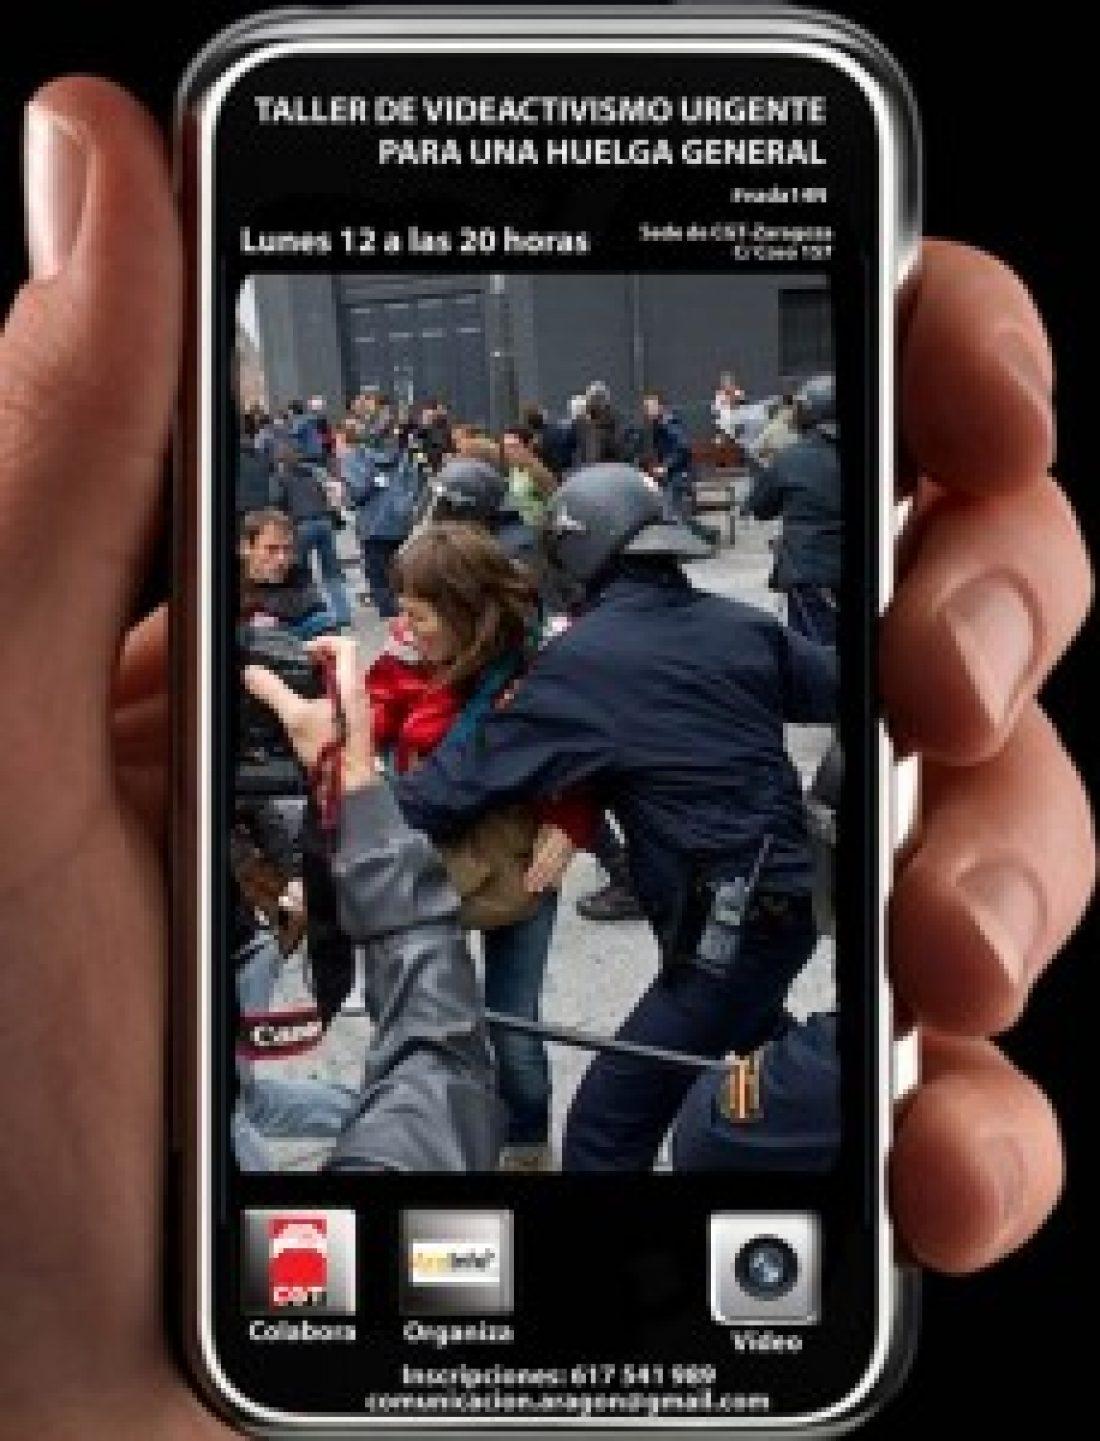 Taller de videoactivismo urgente para una Huelga General